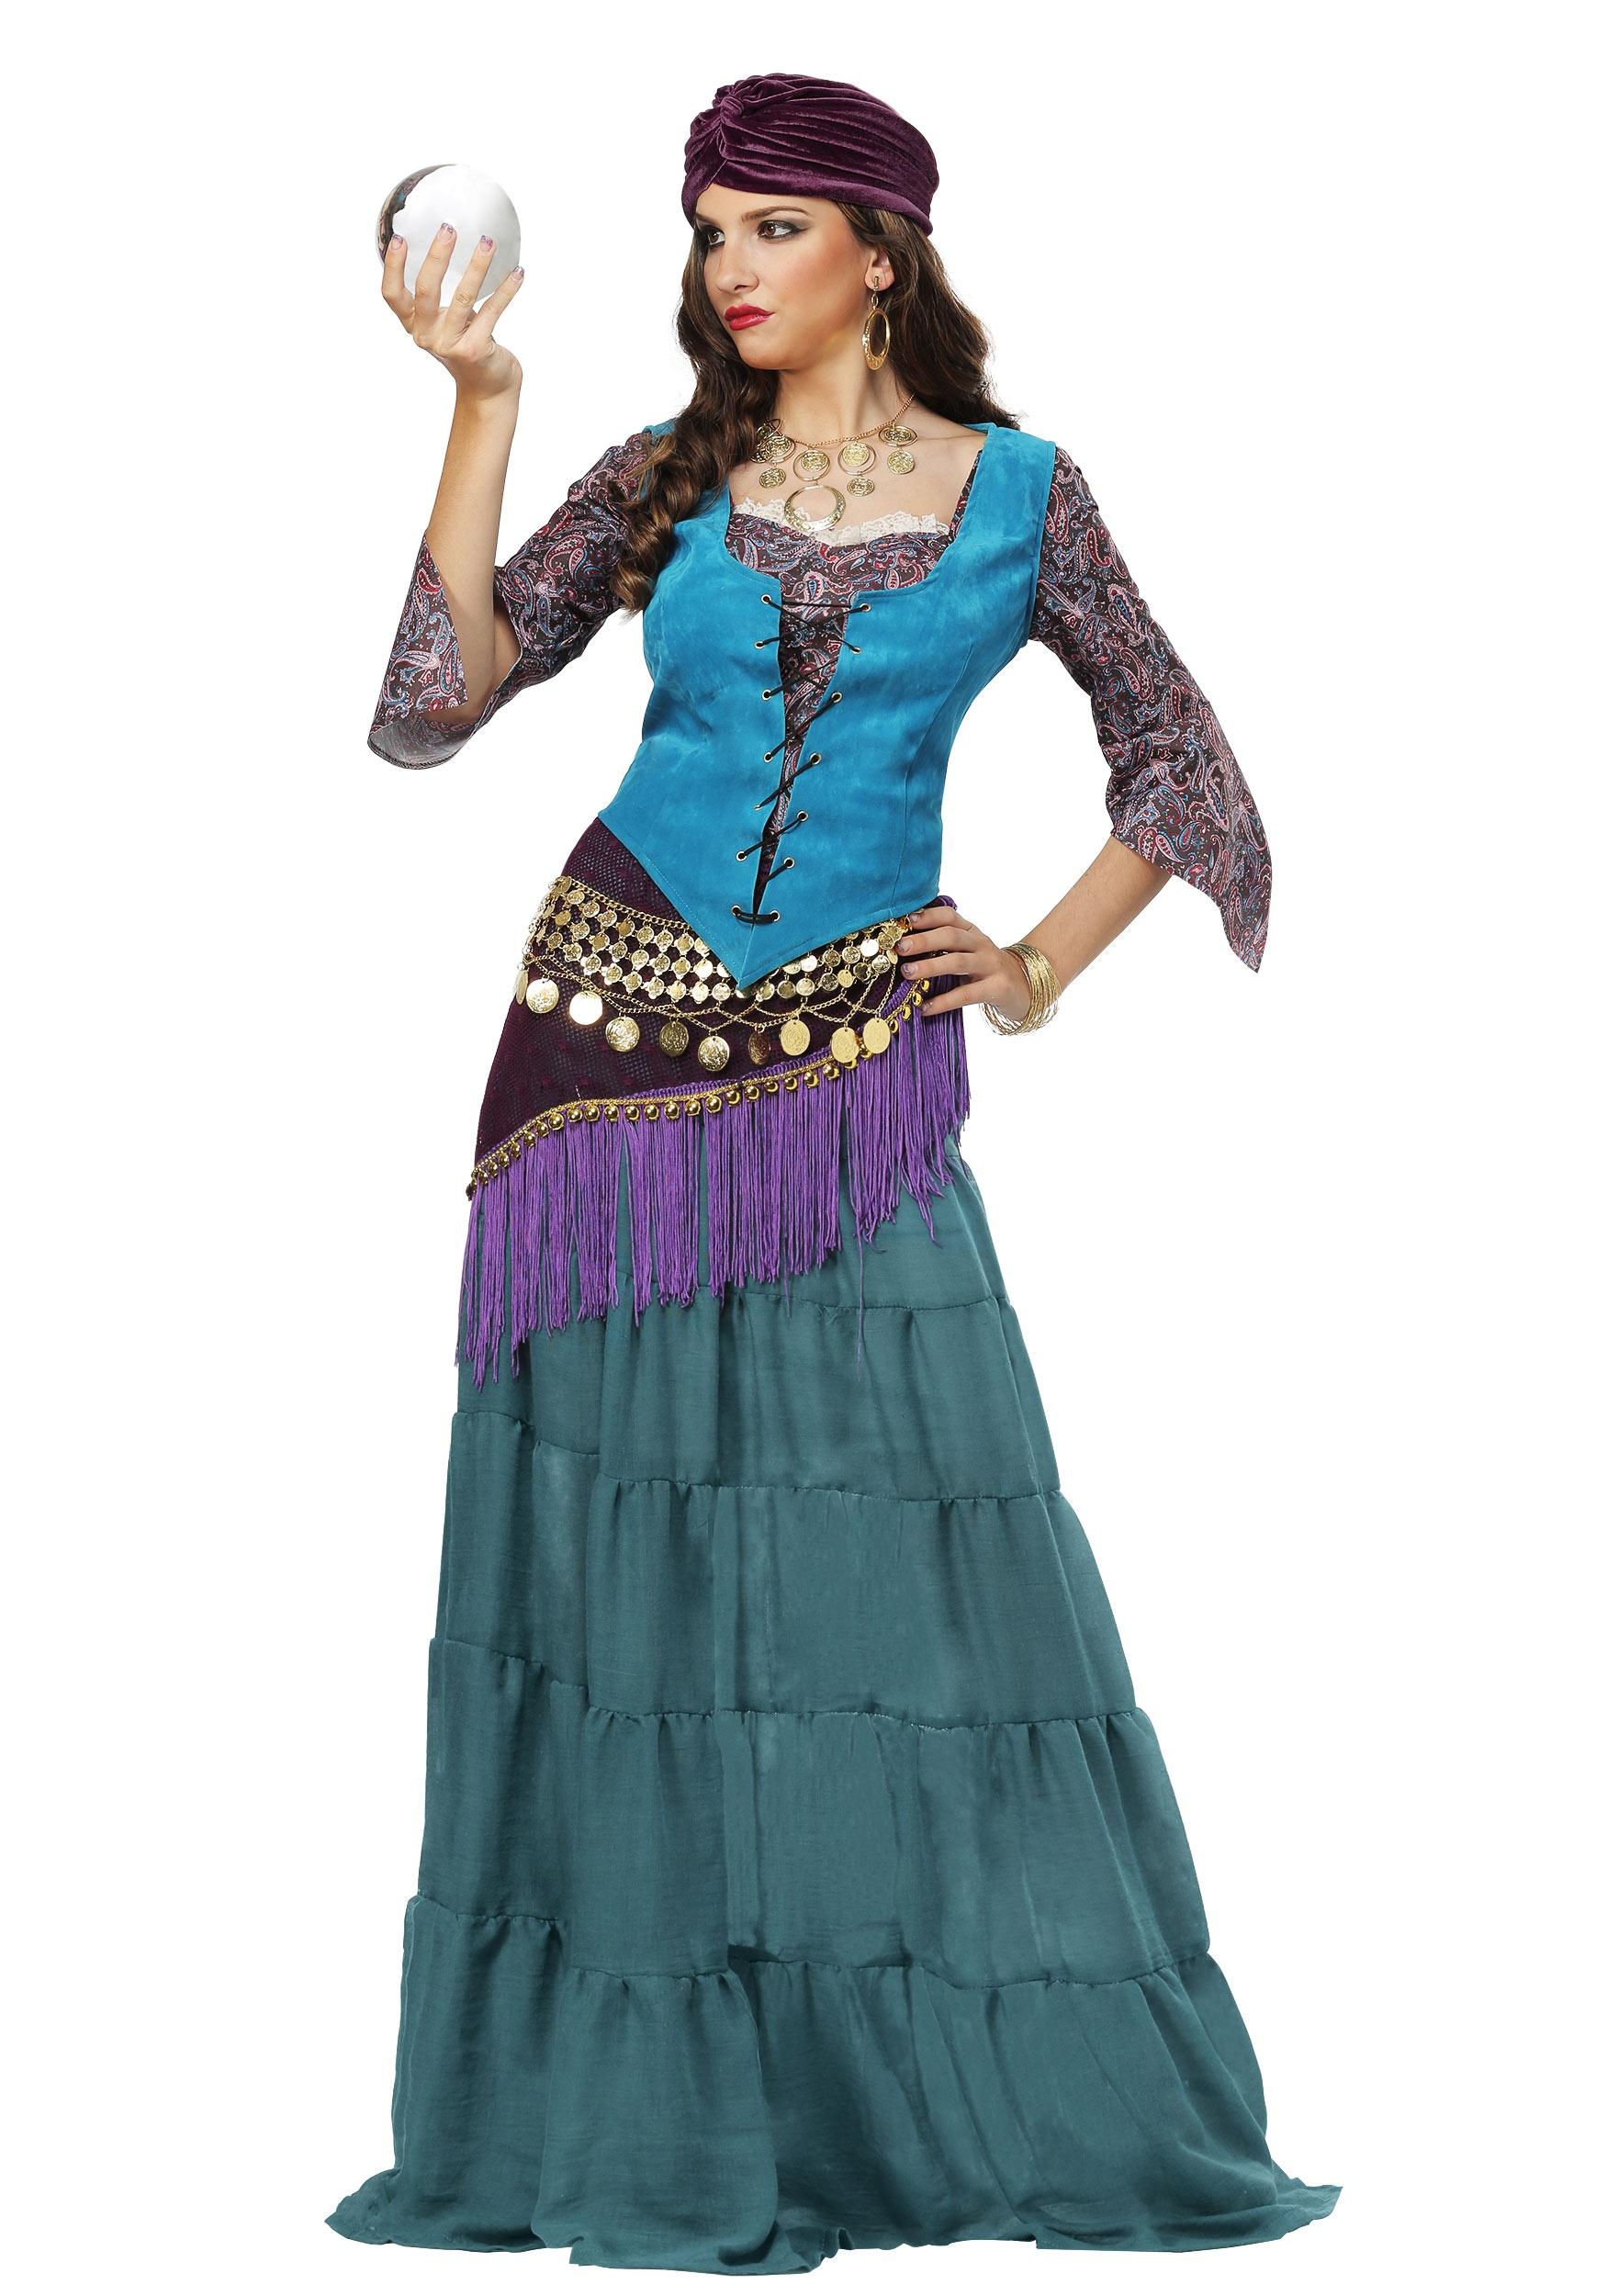 Fabulous Fortune Teller Gypsy Costume For Women